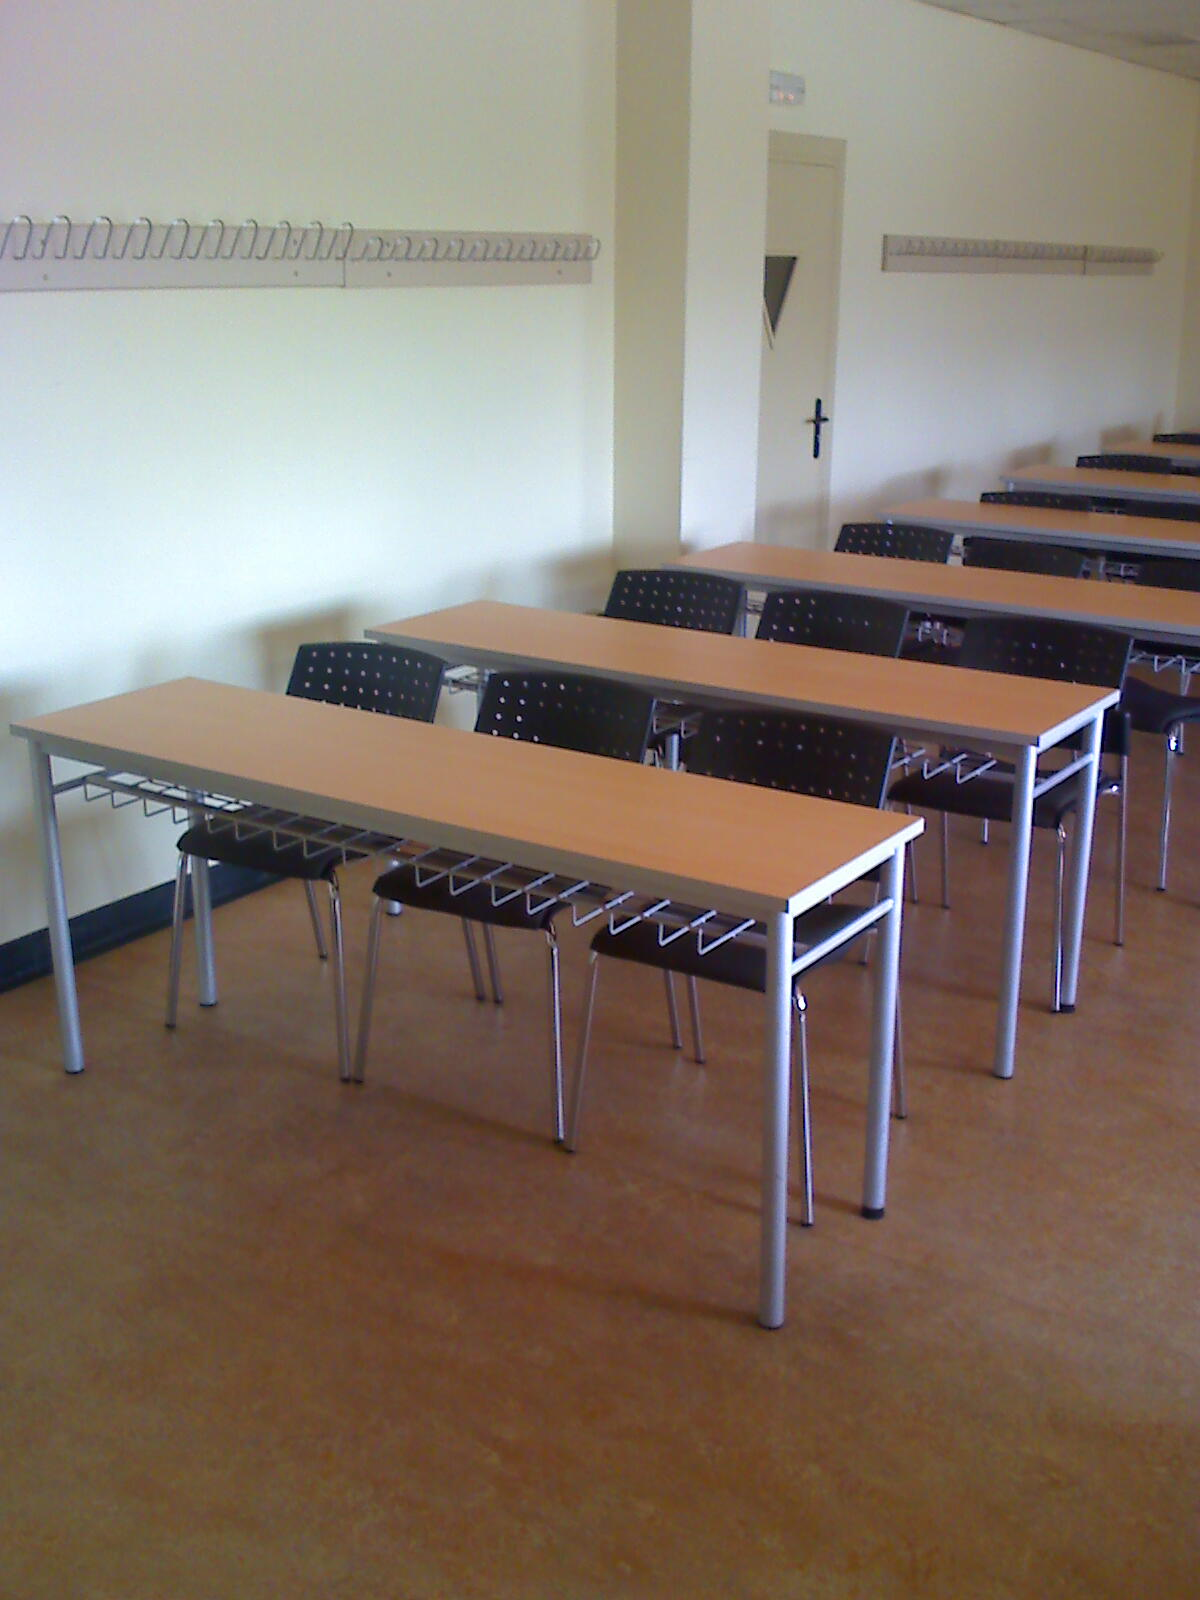 Muebles pupitres escolares obtenga ideas dise o de for Muebles para aulas